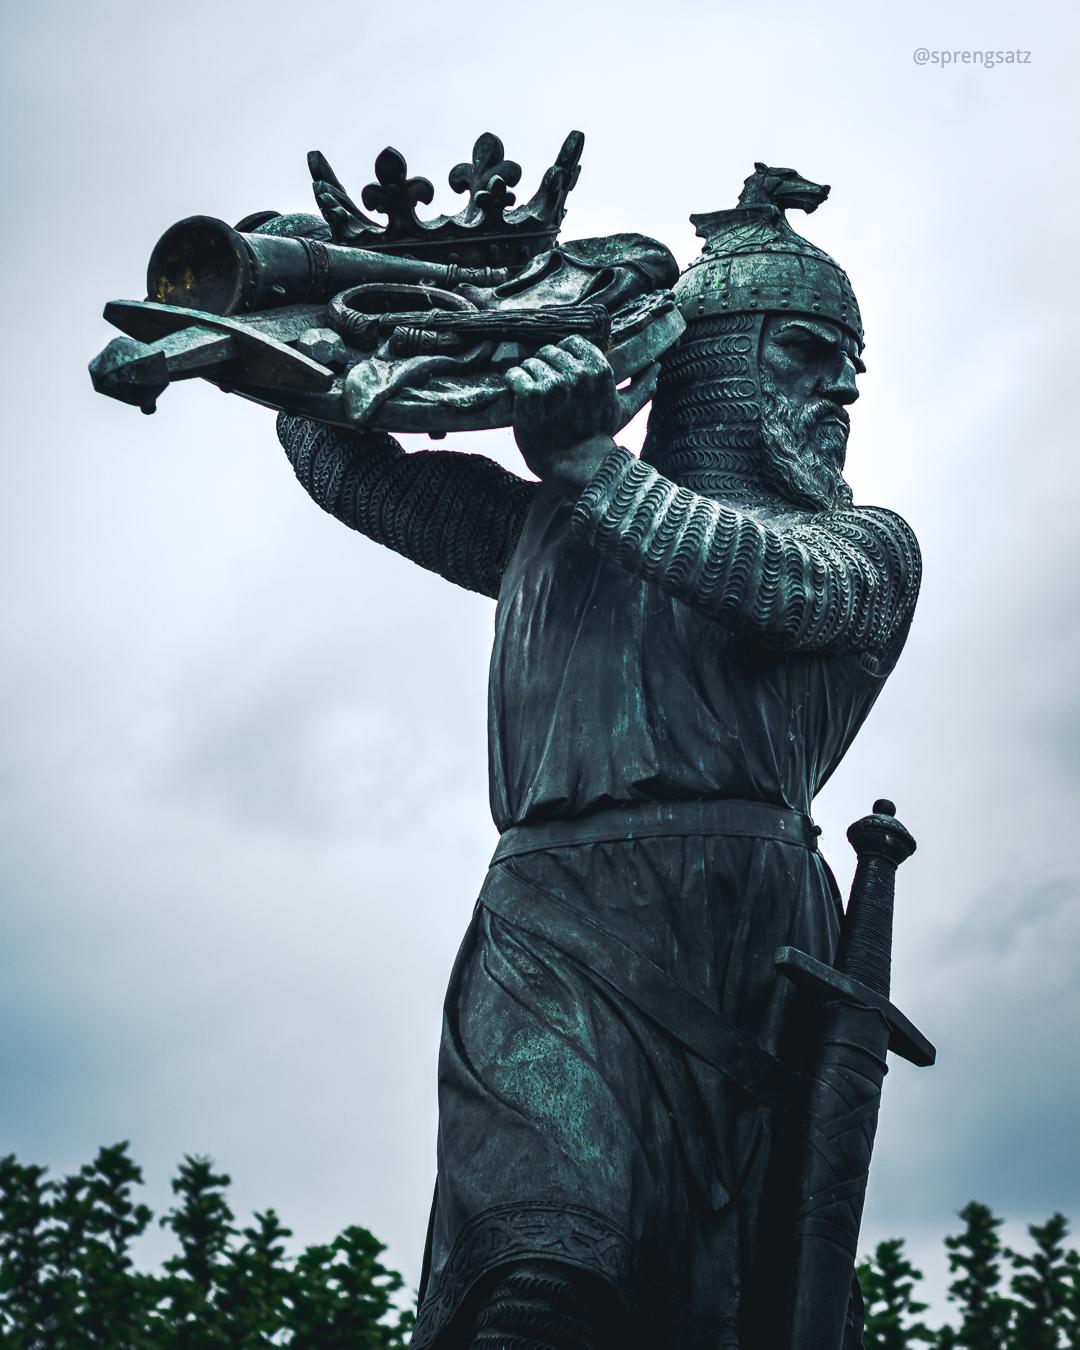 Hagendenkmal (Nibelungensaga) in Worms am Rhein